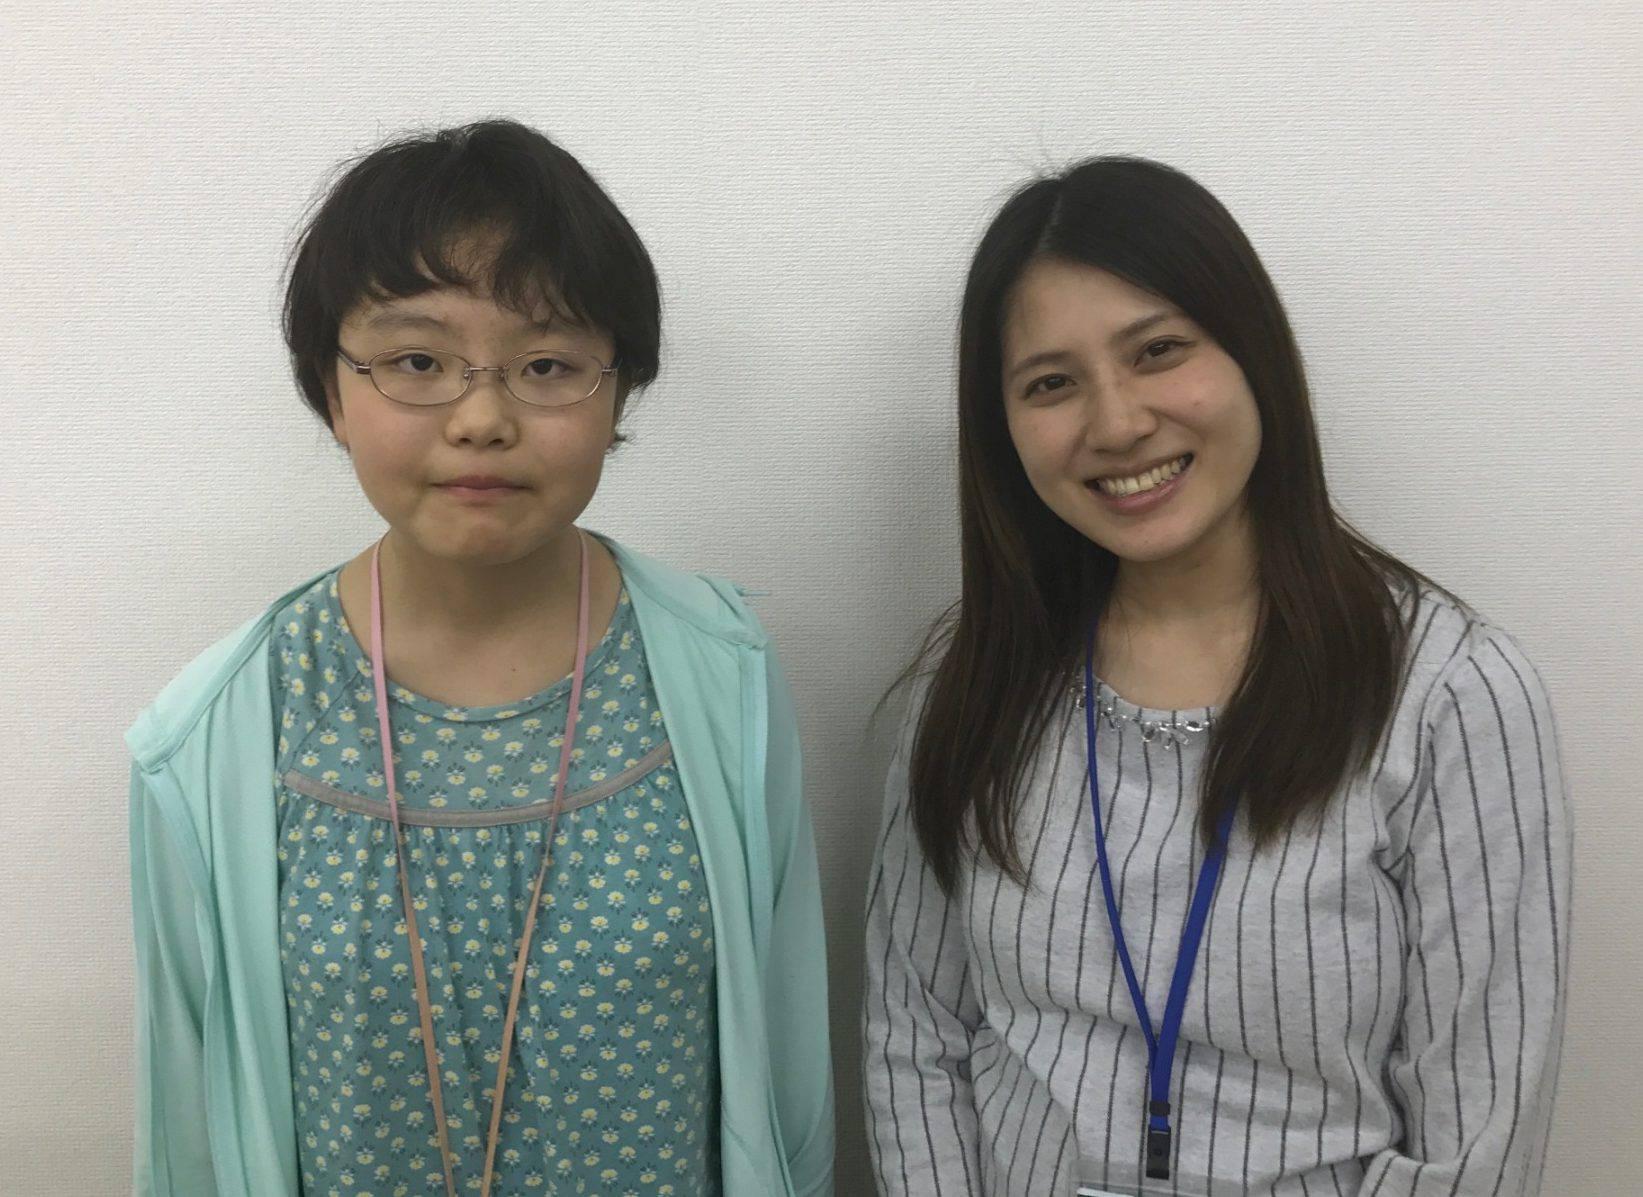 H29夏 中学2年 遠藤楓さん 石川先生